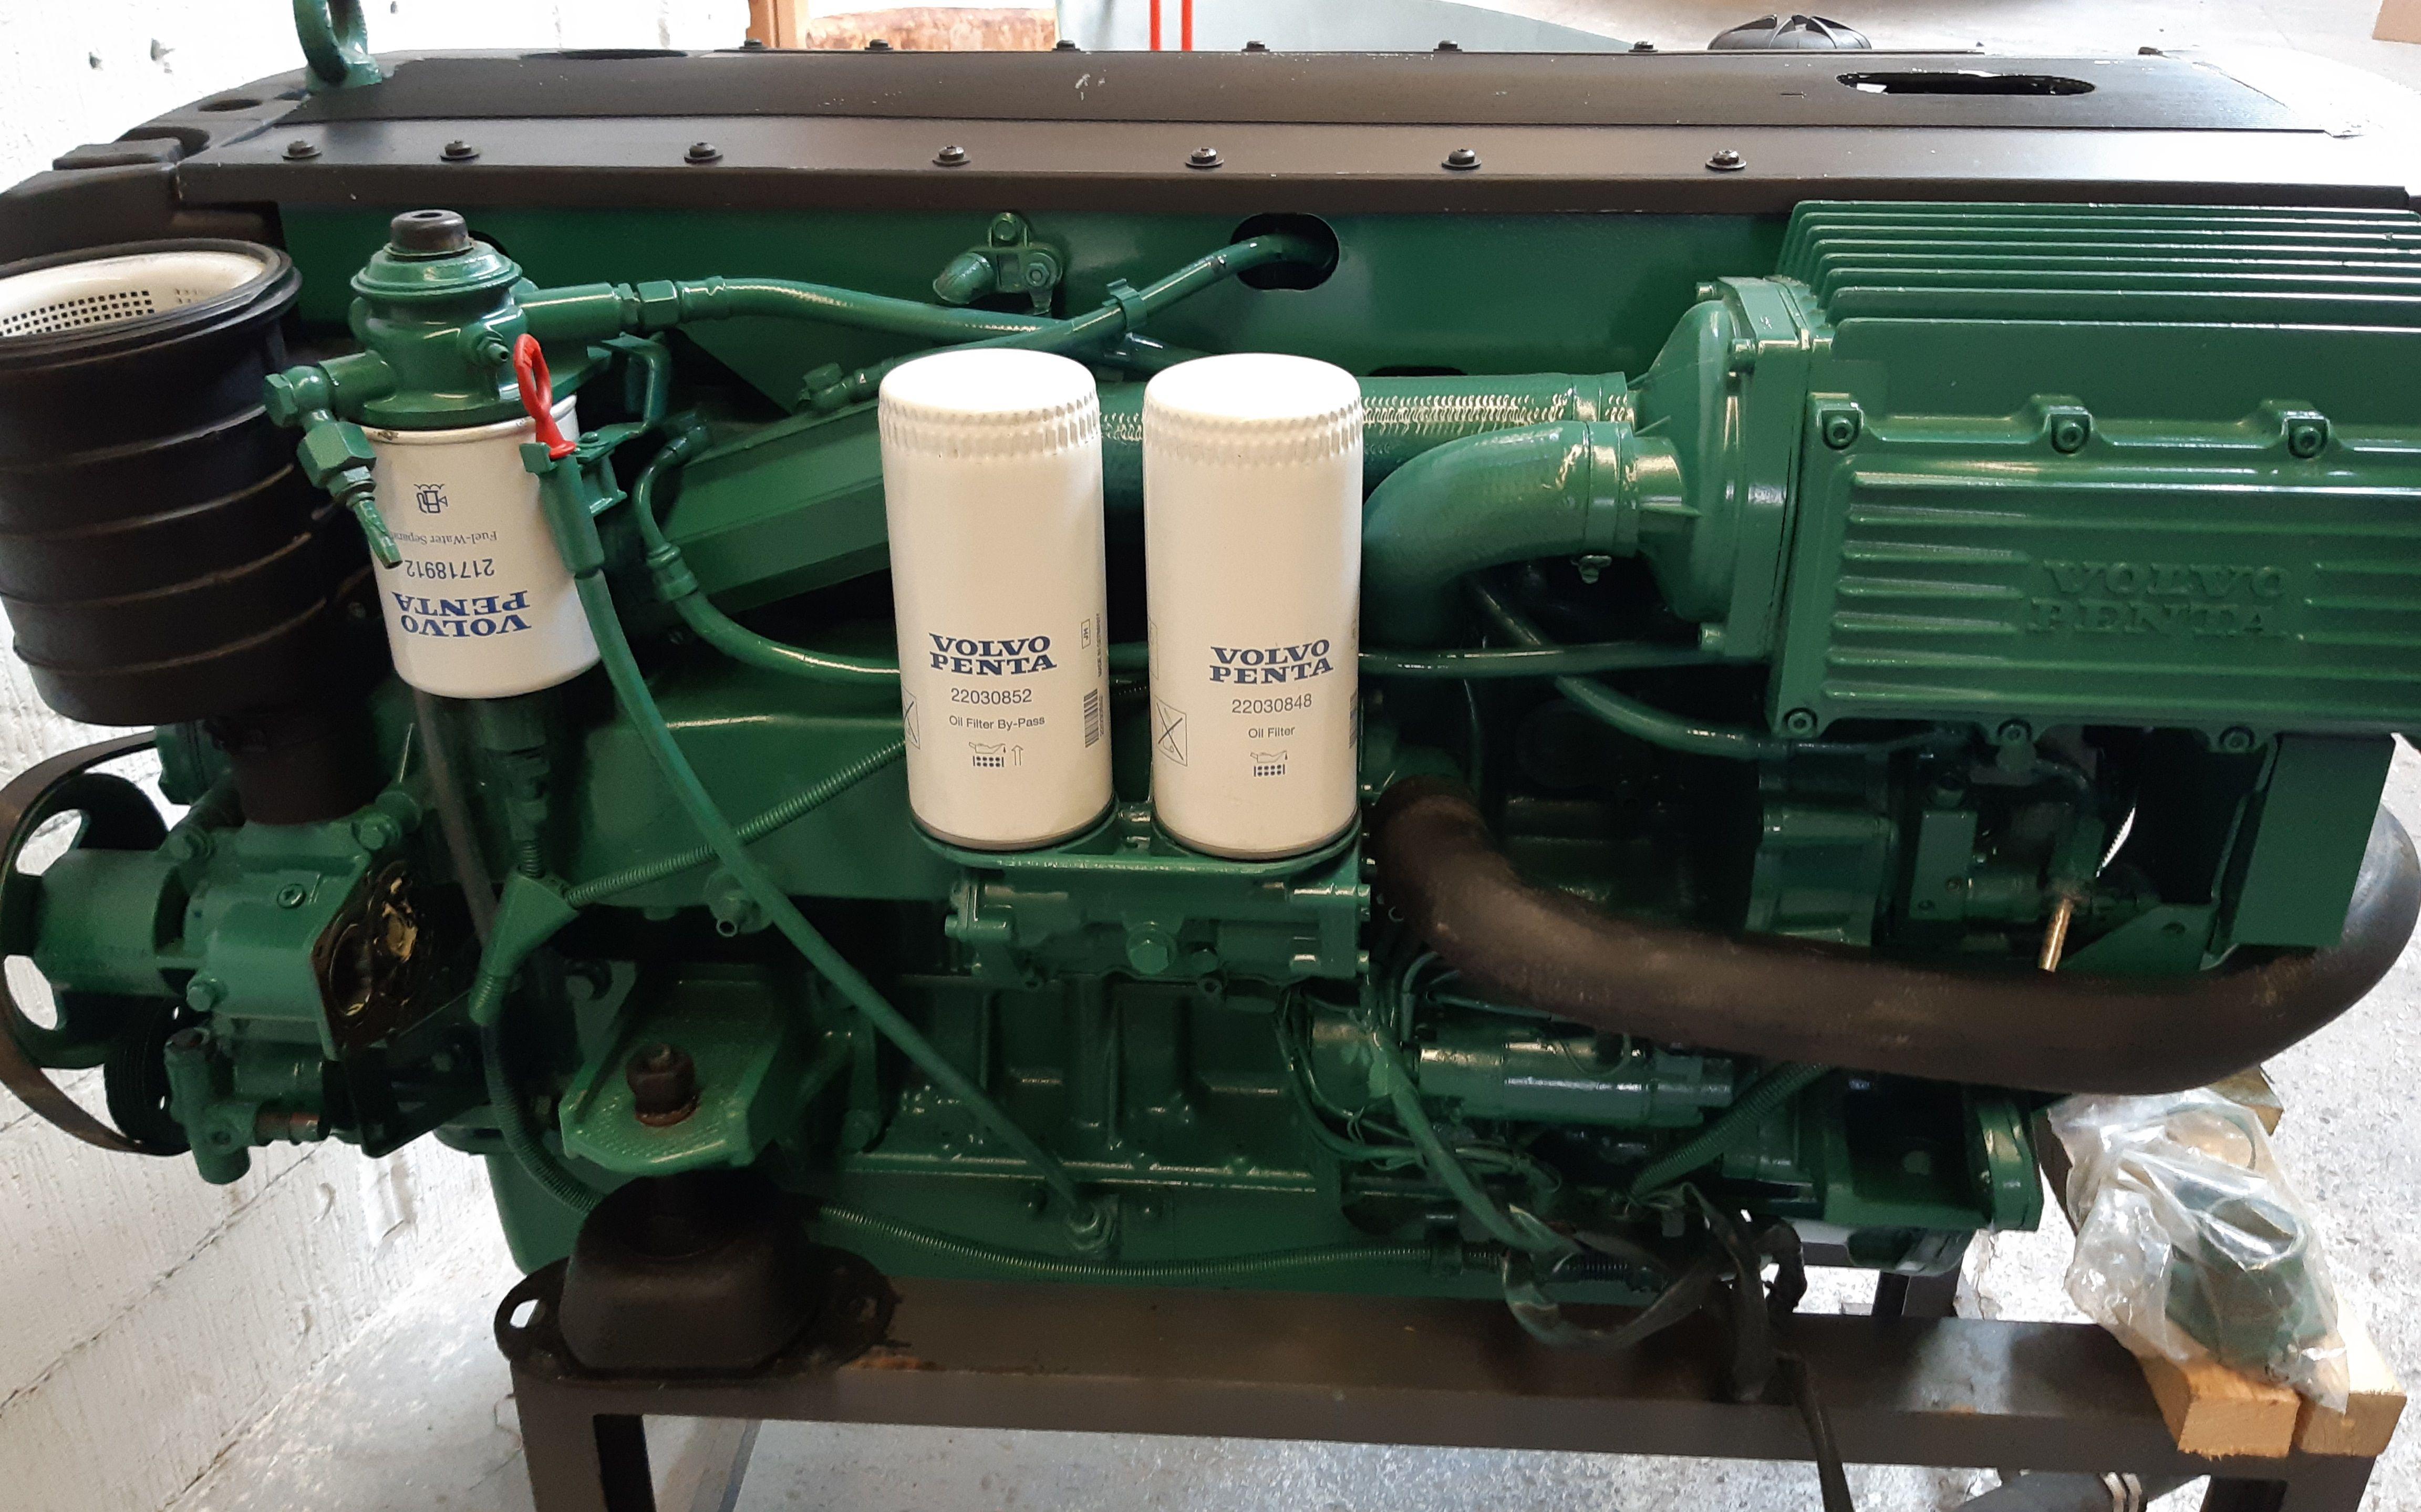 Volvo Penta D6 310 Evc C 450 Running Hours Engines For Sale Volvo Engineering